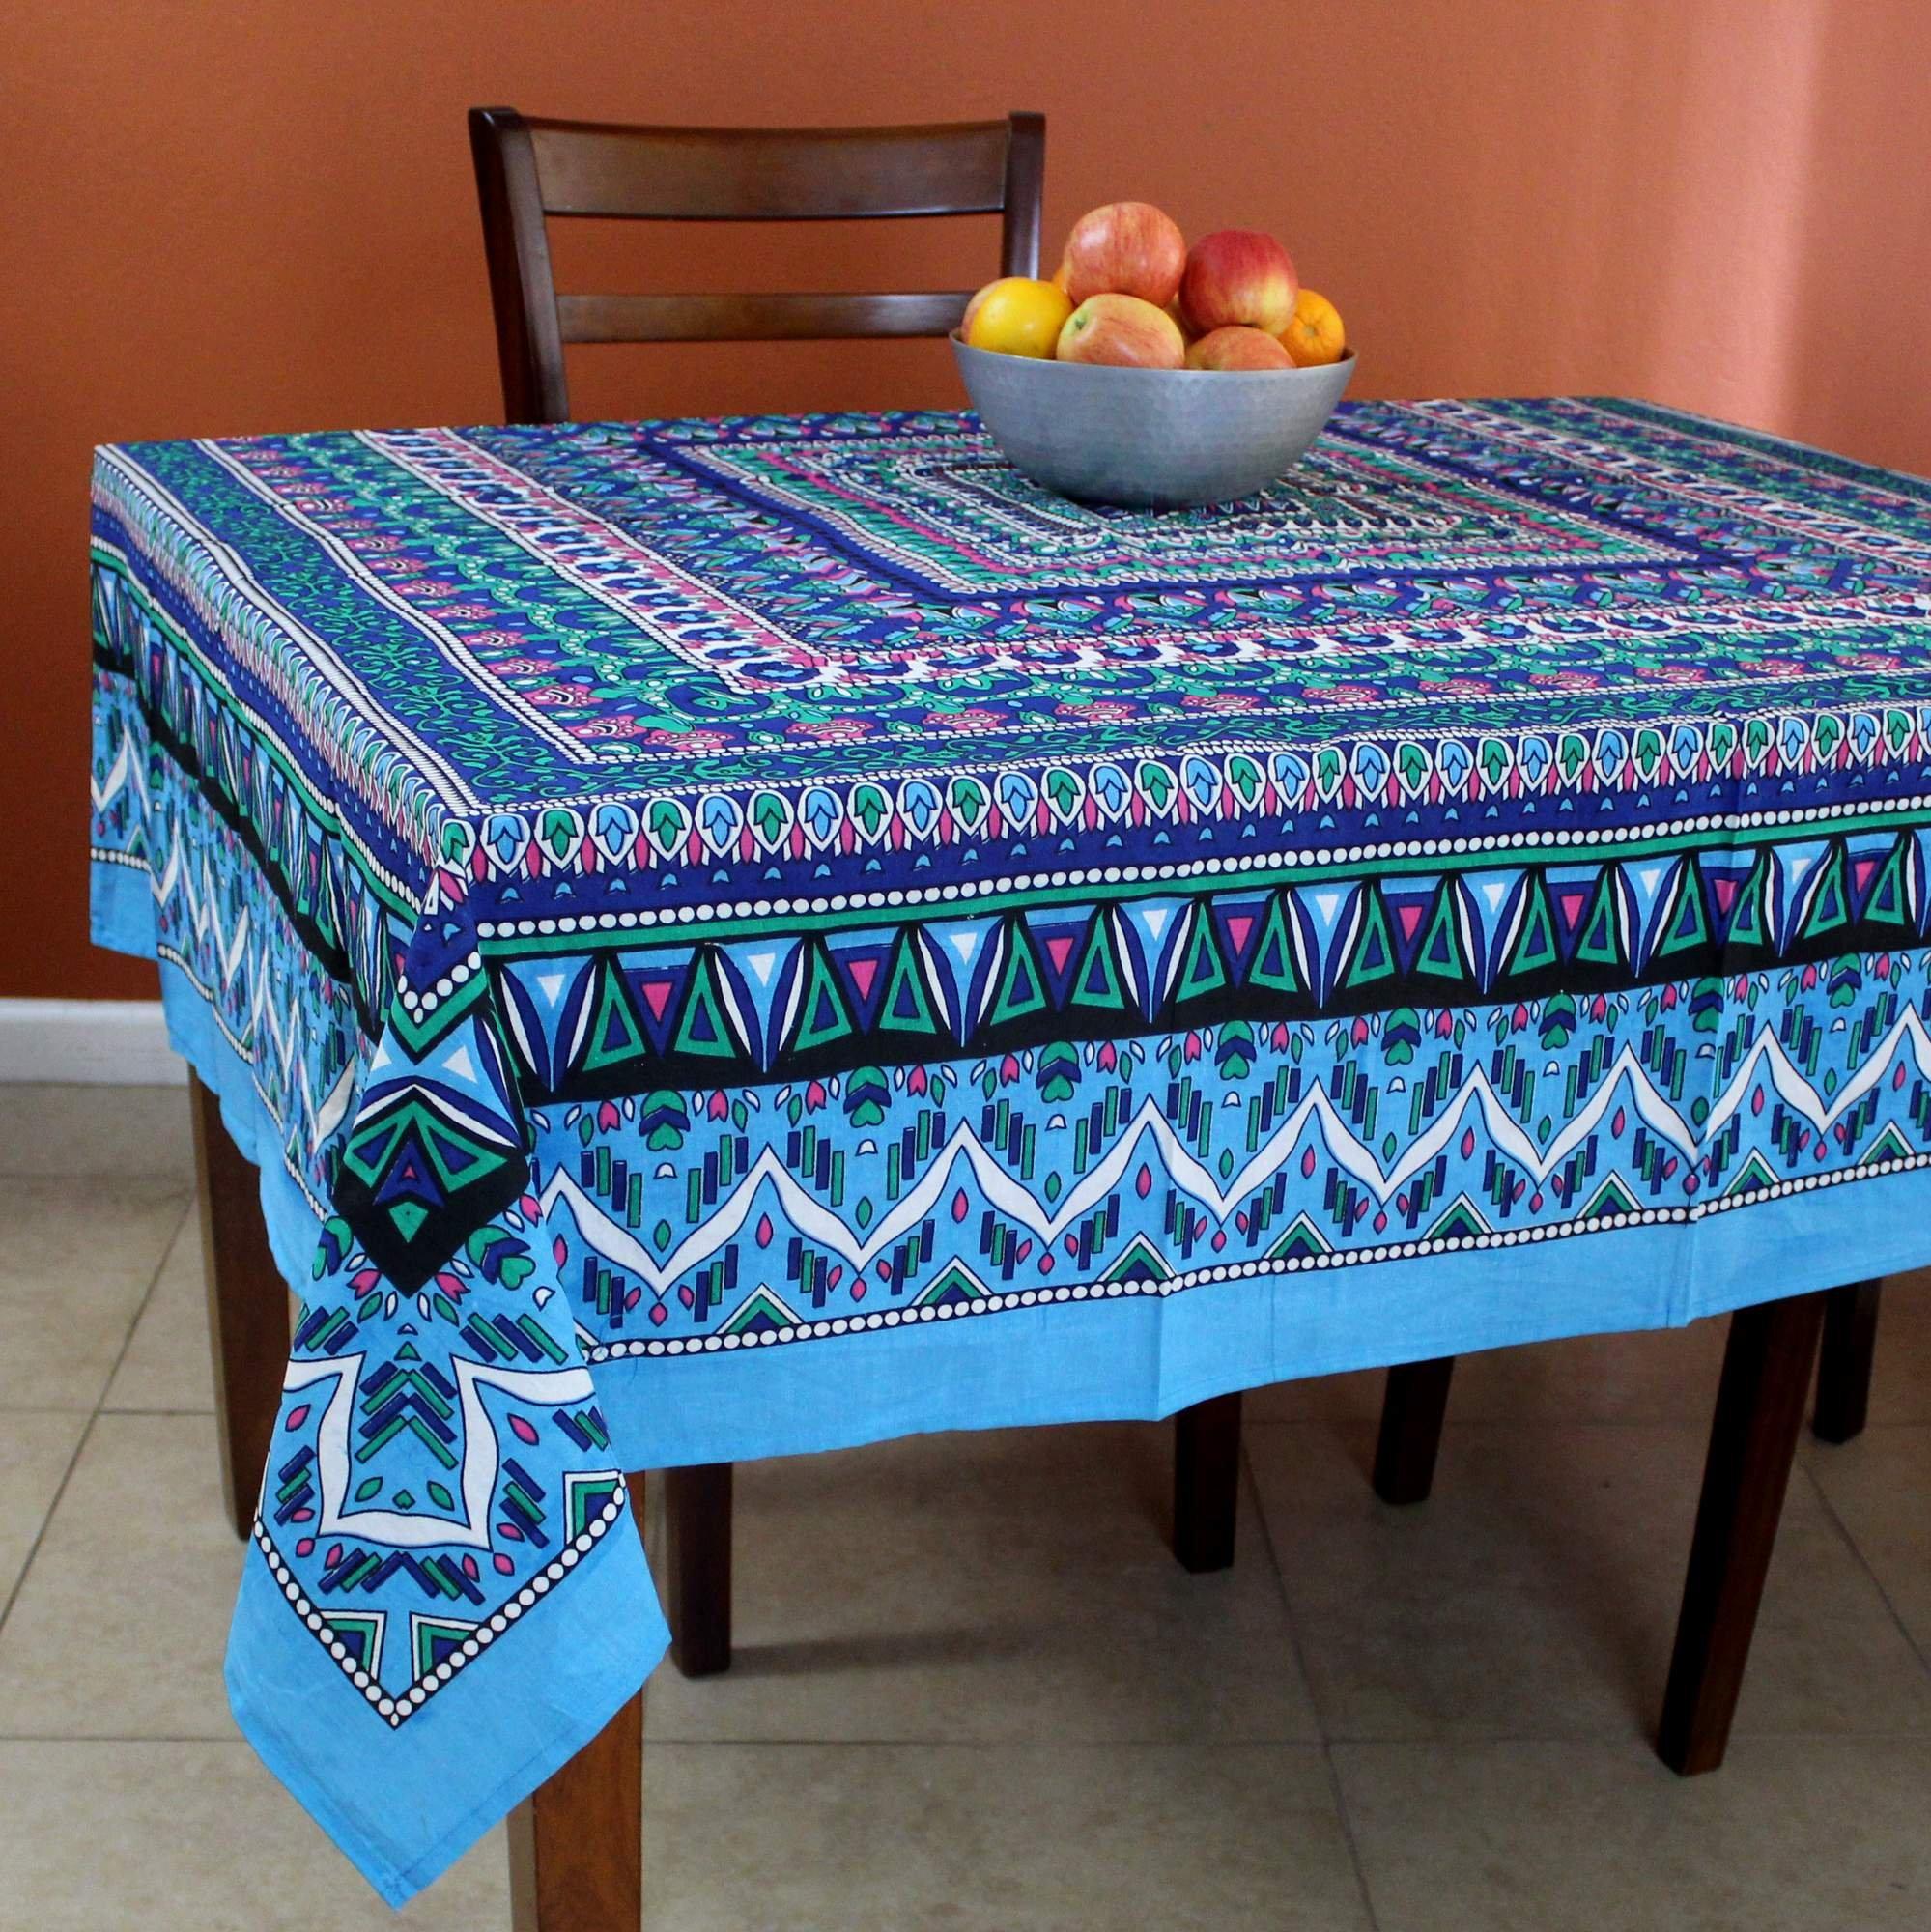 India Arts Handmade Cotton Geometric Mandala Floral Tablecloth Square Beach Sheet Beach Throw (Blue Pink, 70 x 70 inches)